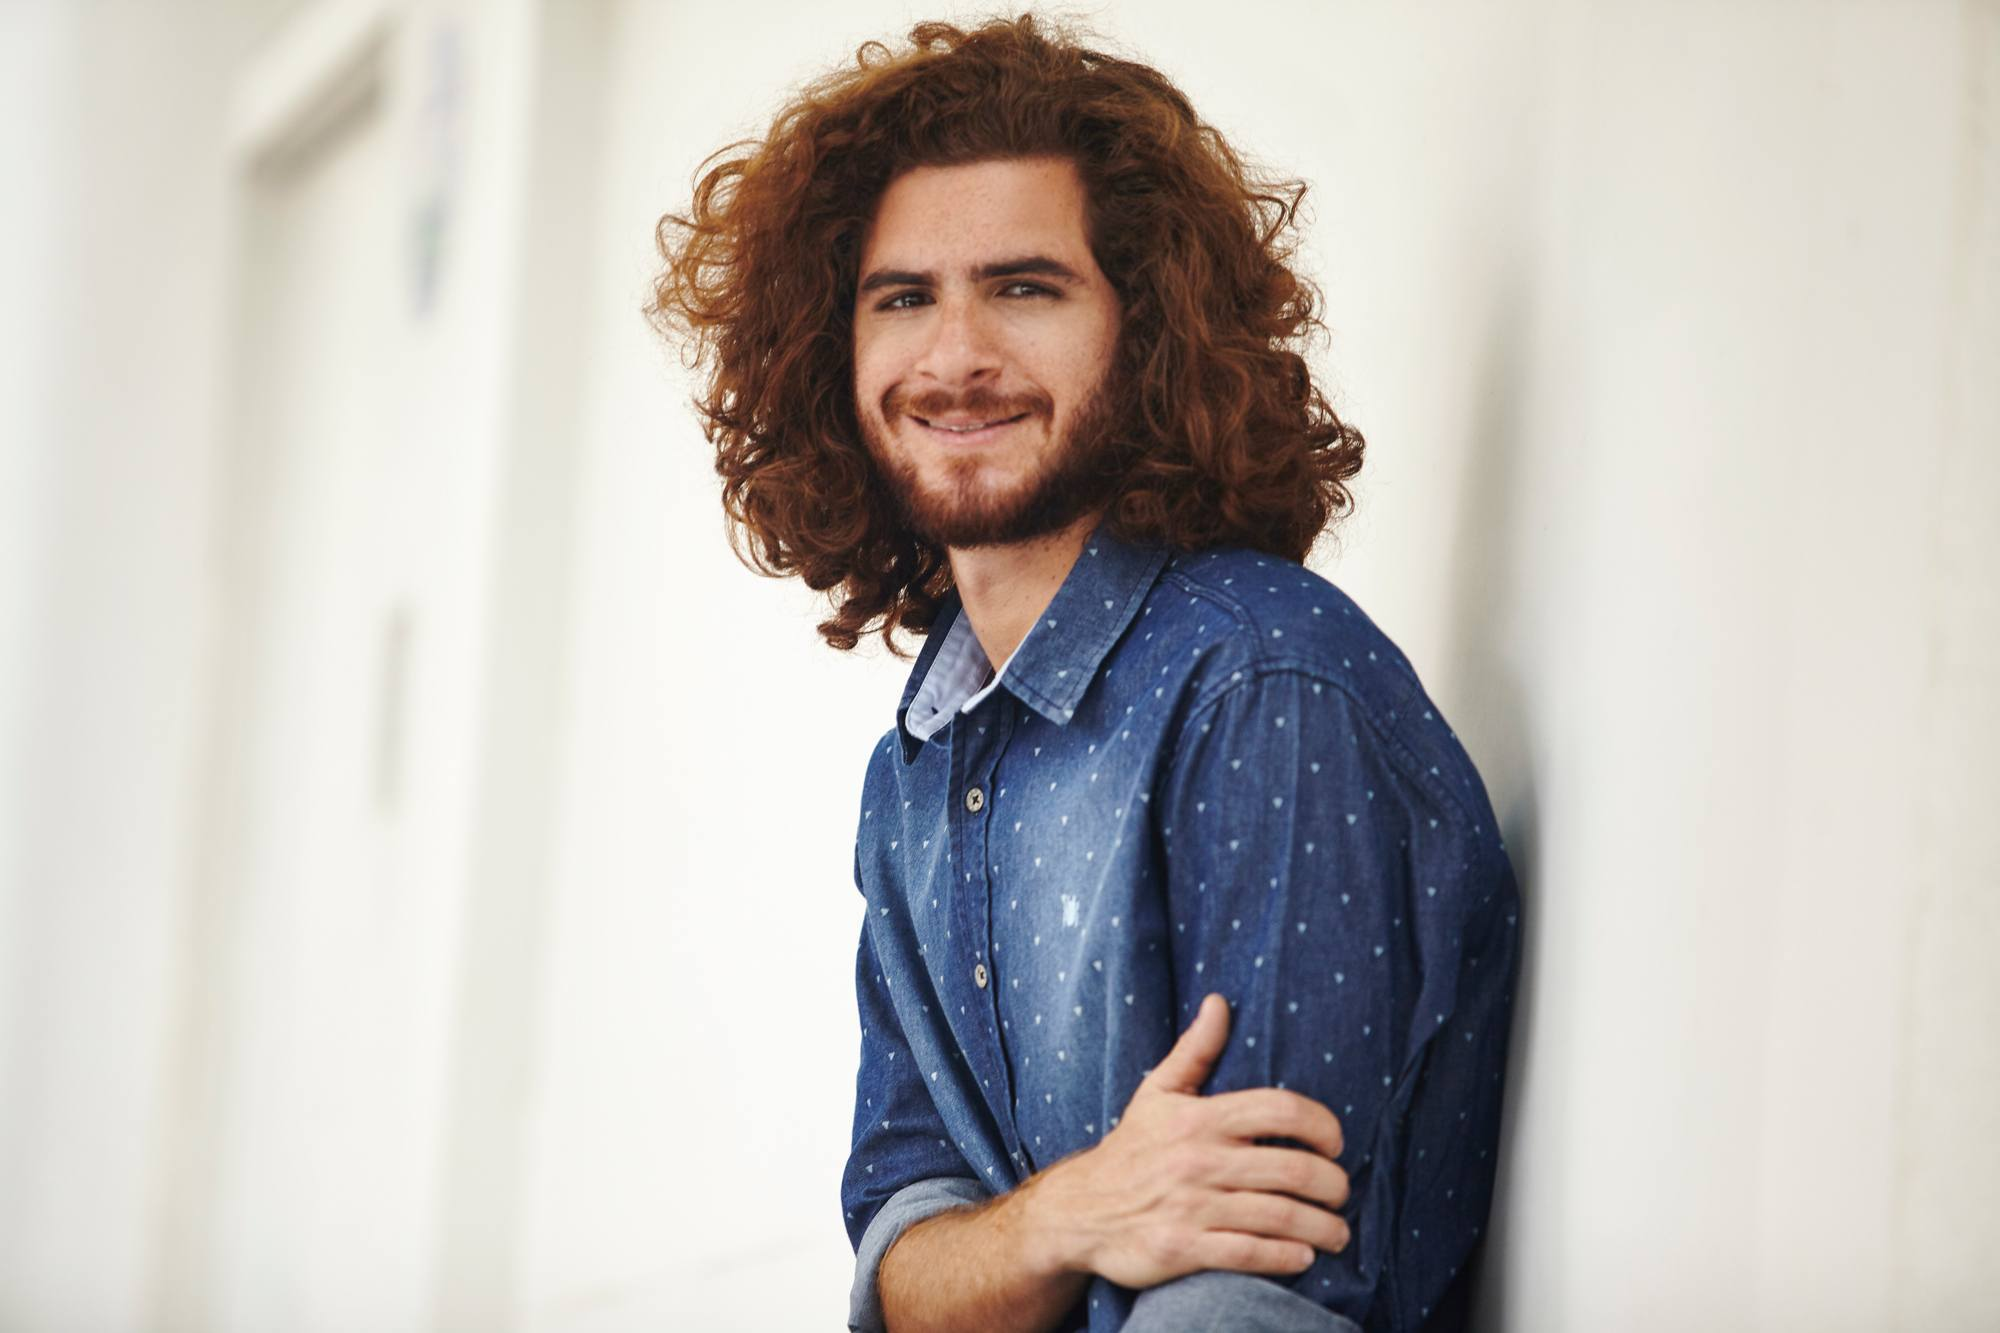 Modelo com cabelo ondulado masculino longo ruivo